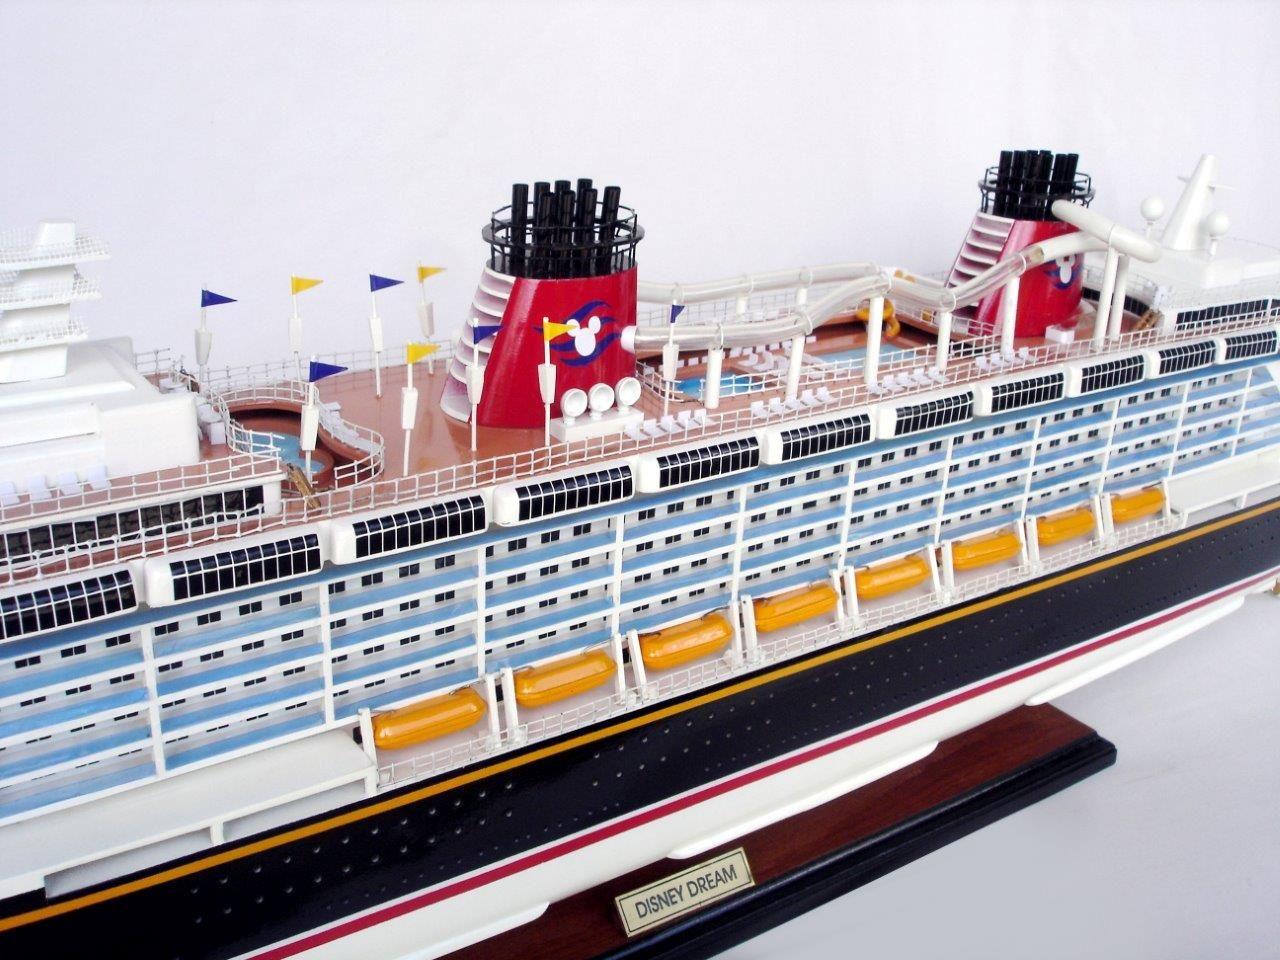 1990-11704-Disney-Dream-Model-boat